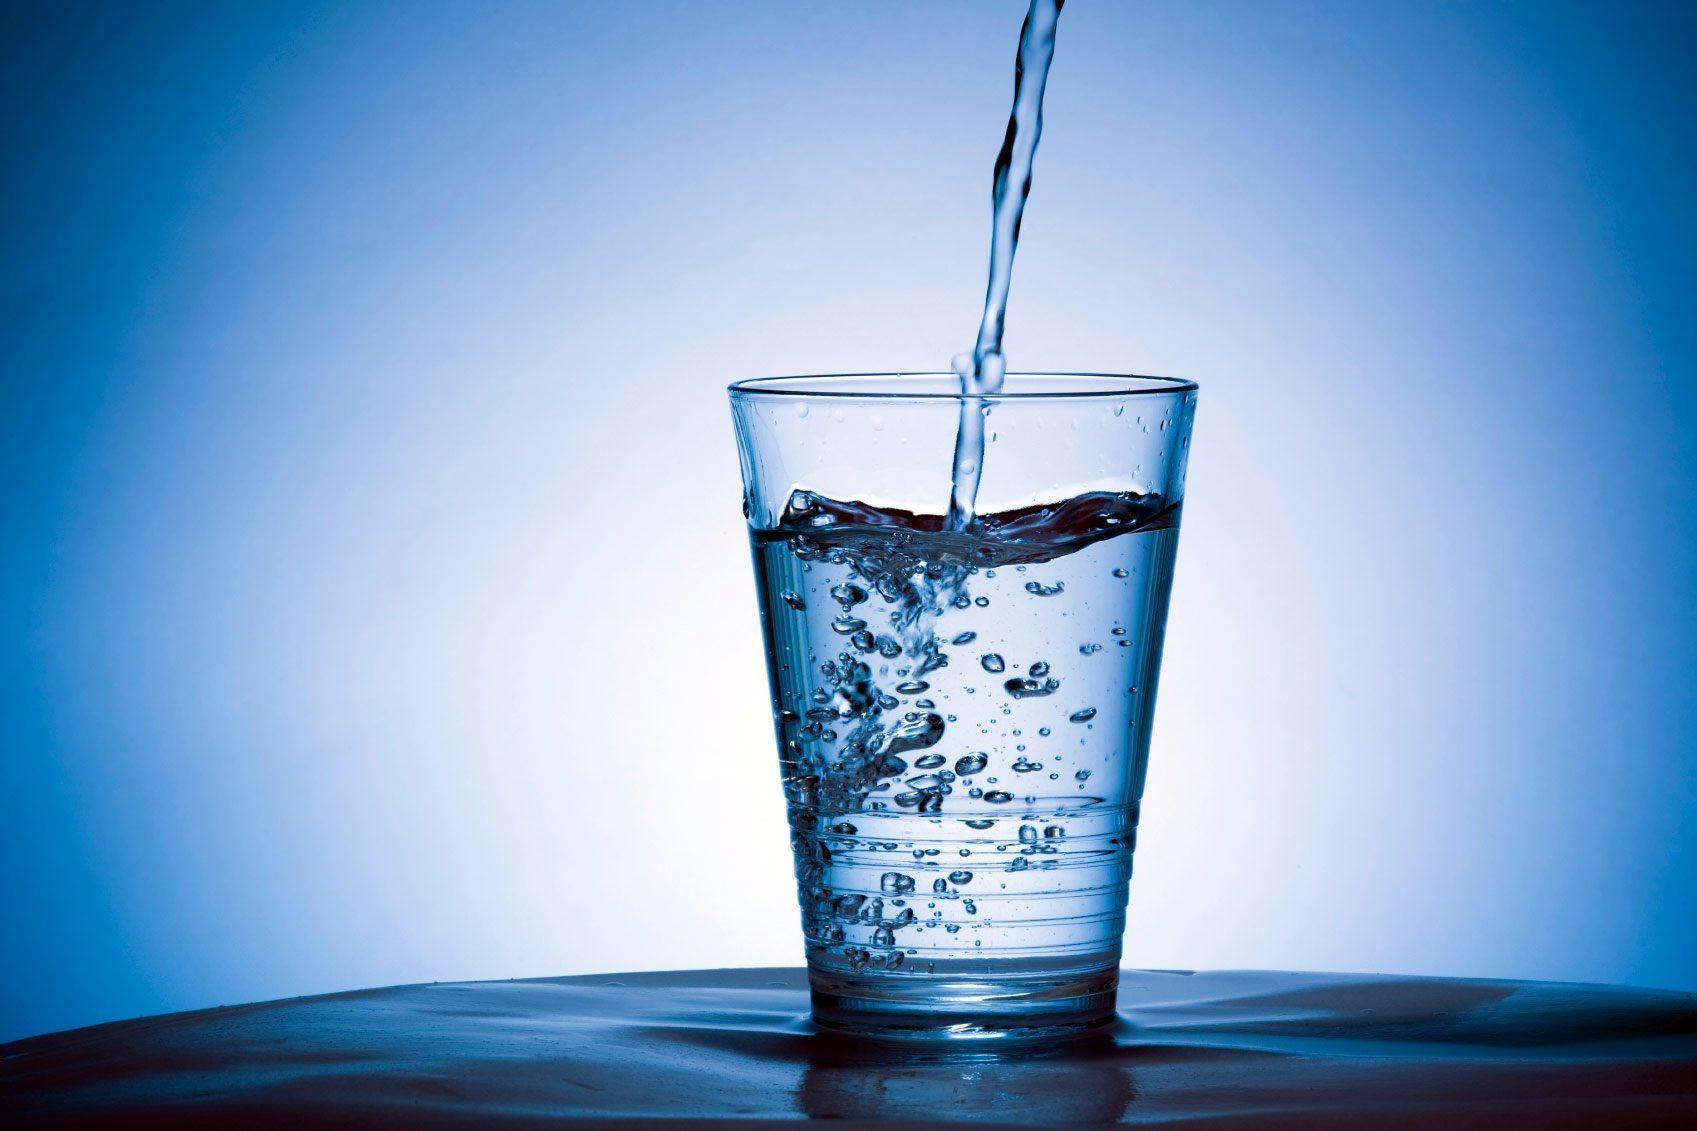 http://drsenaniwijesena.com/wp-content/uploads/2016/08/glass-water.jpg